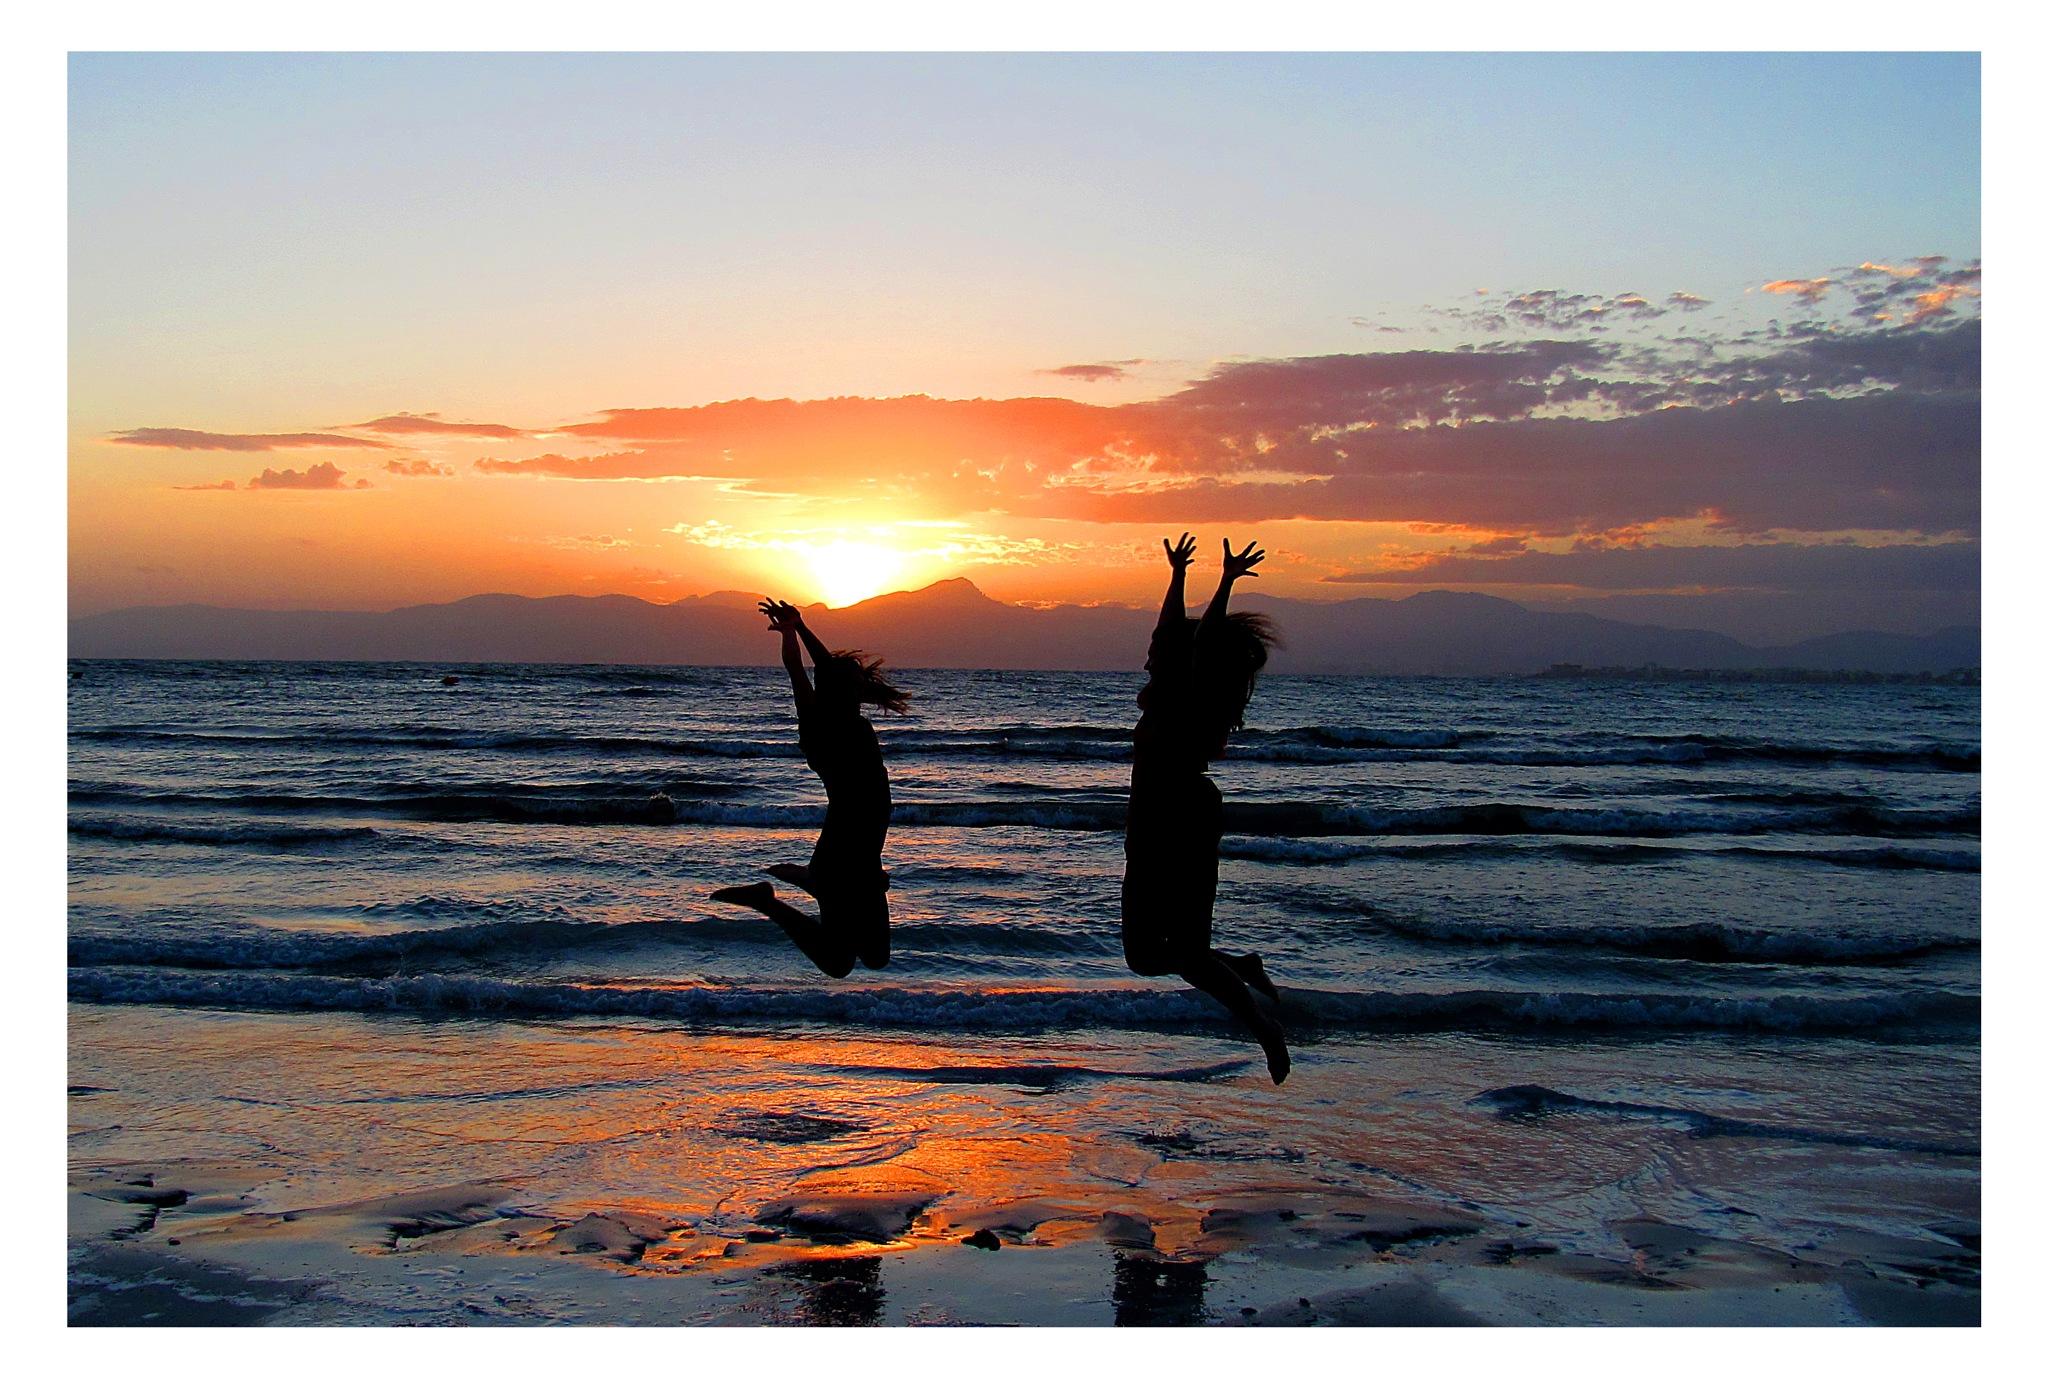 Happy girls at the beach - Mallorca by Fritz O. K. Jakobsen